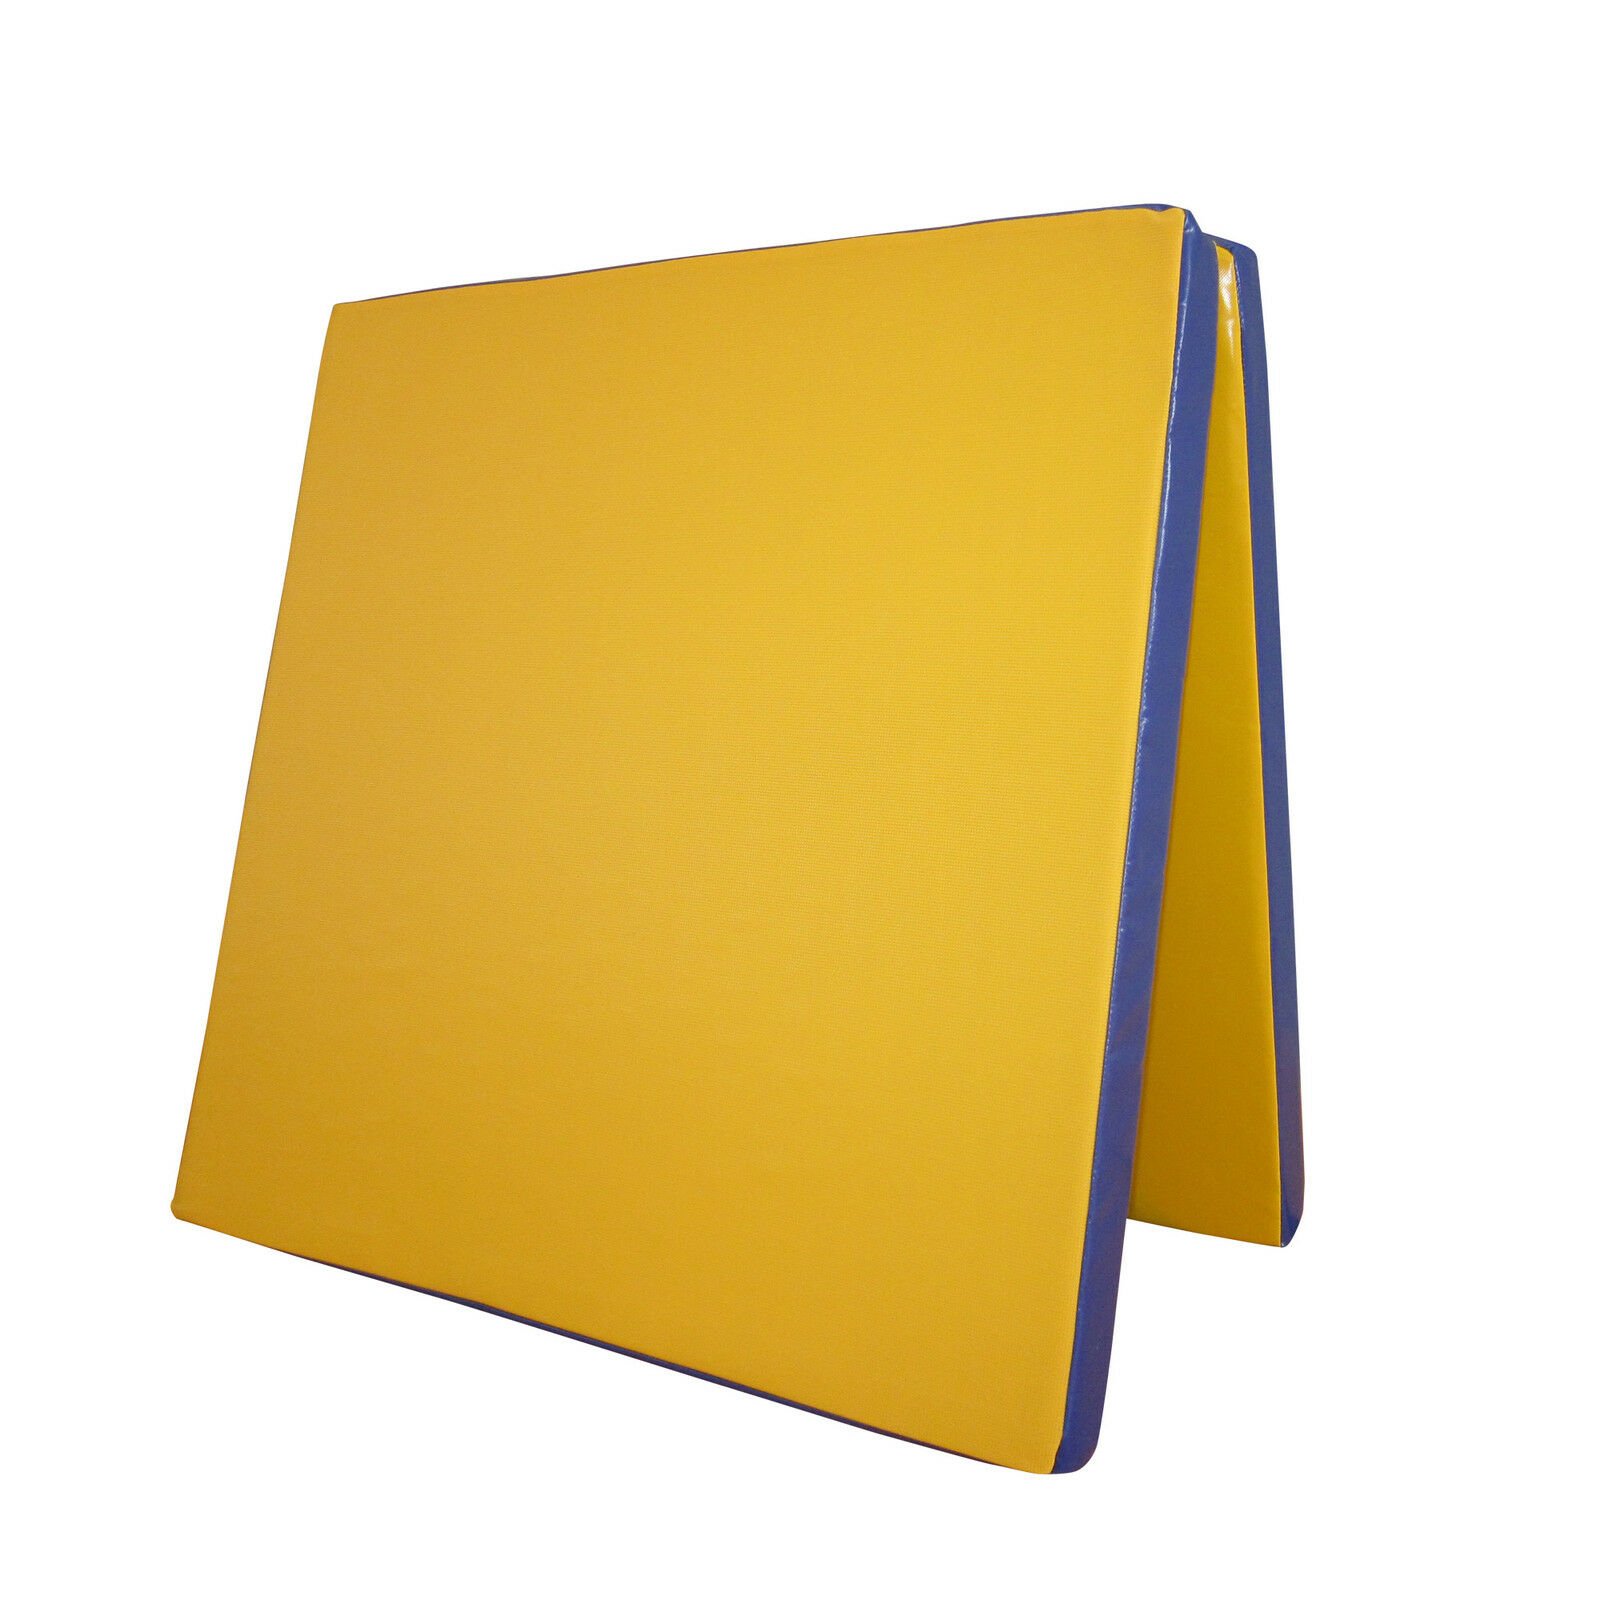 Grevinga® FUN Turnmatte klappbar | 200 x 100 x 6 cm | GELB - BLAU | RG 35